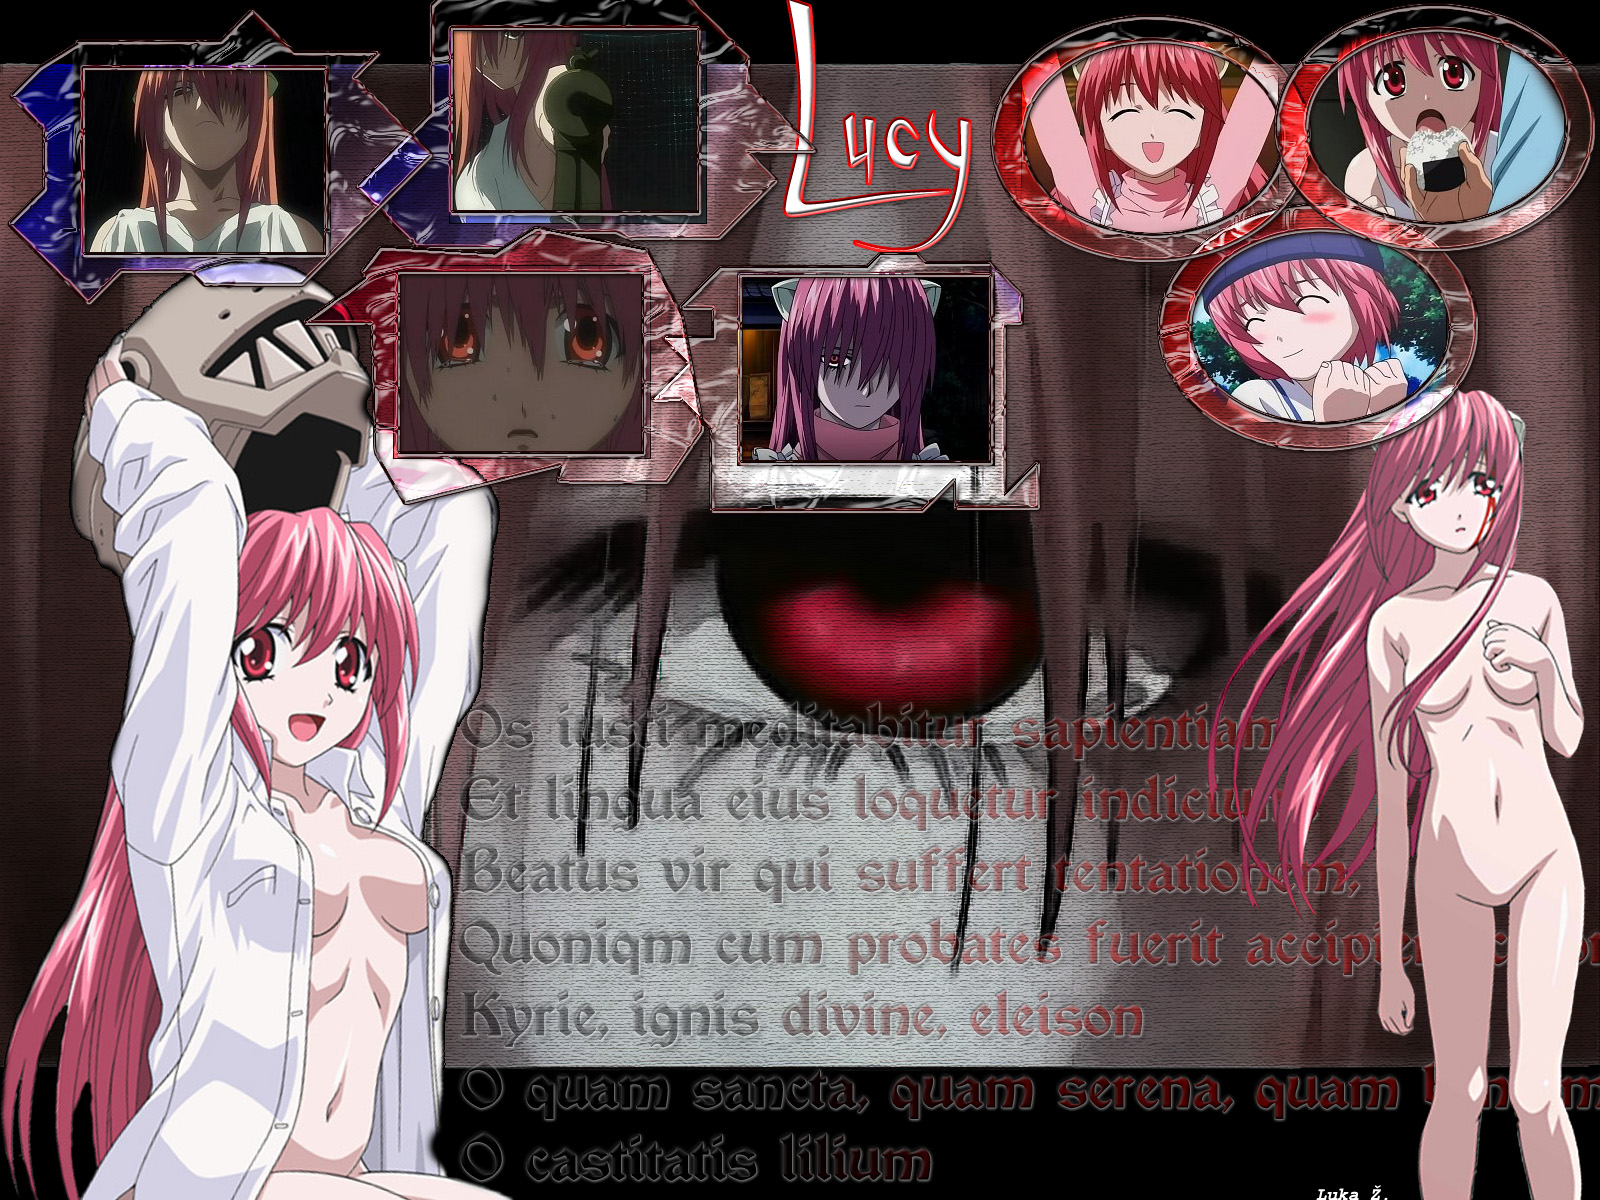 El Manga de Elfen Lied - ONLINE Konachan.com%20-%2025913%20collage%20elfen_lied%20gun%20lucy%20nude